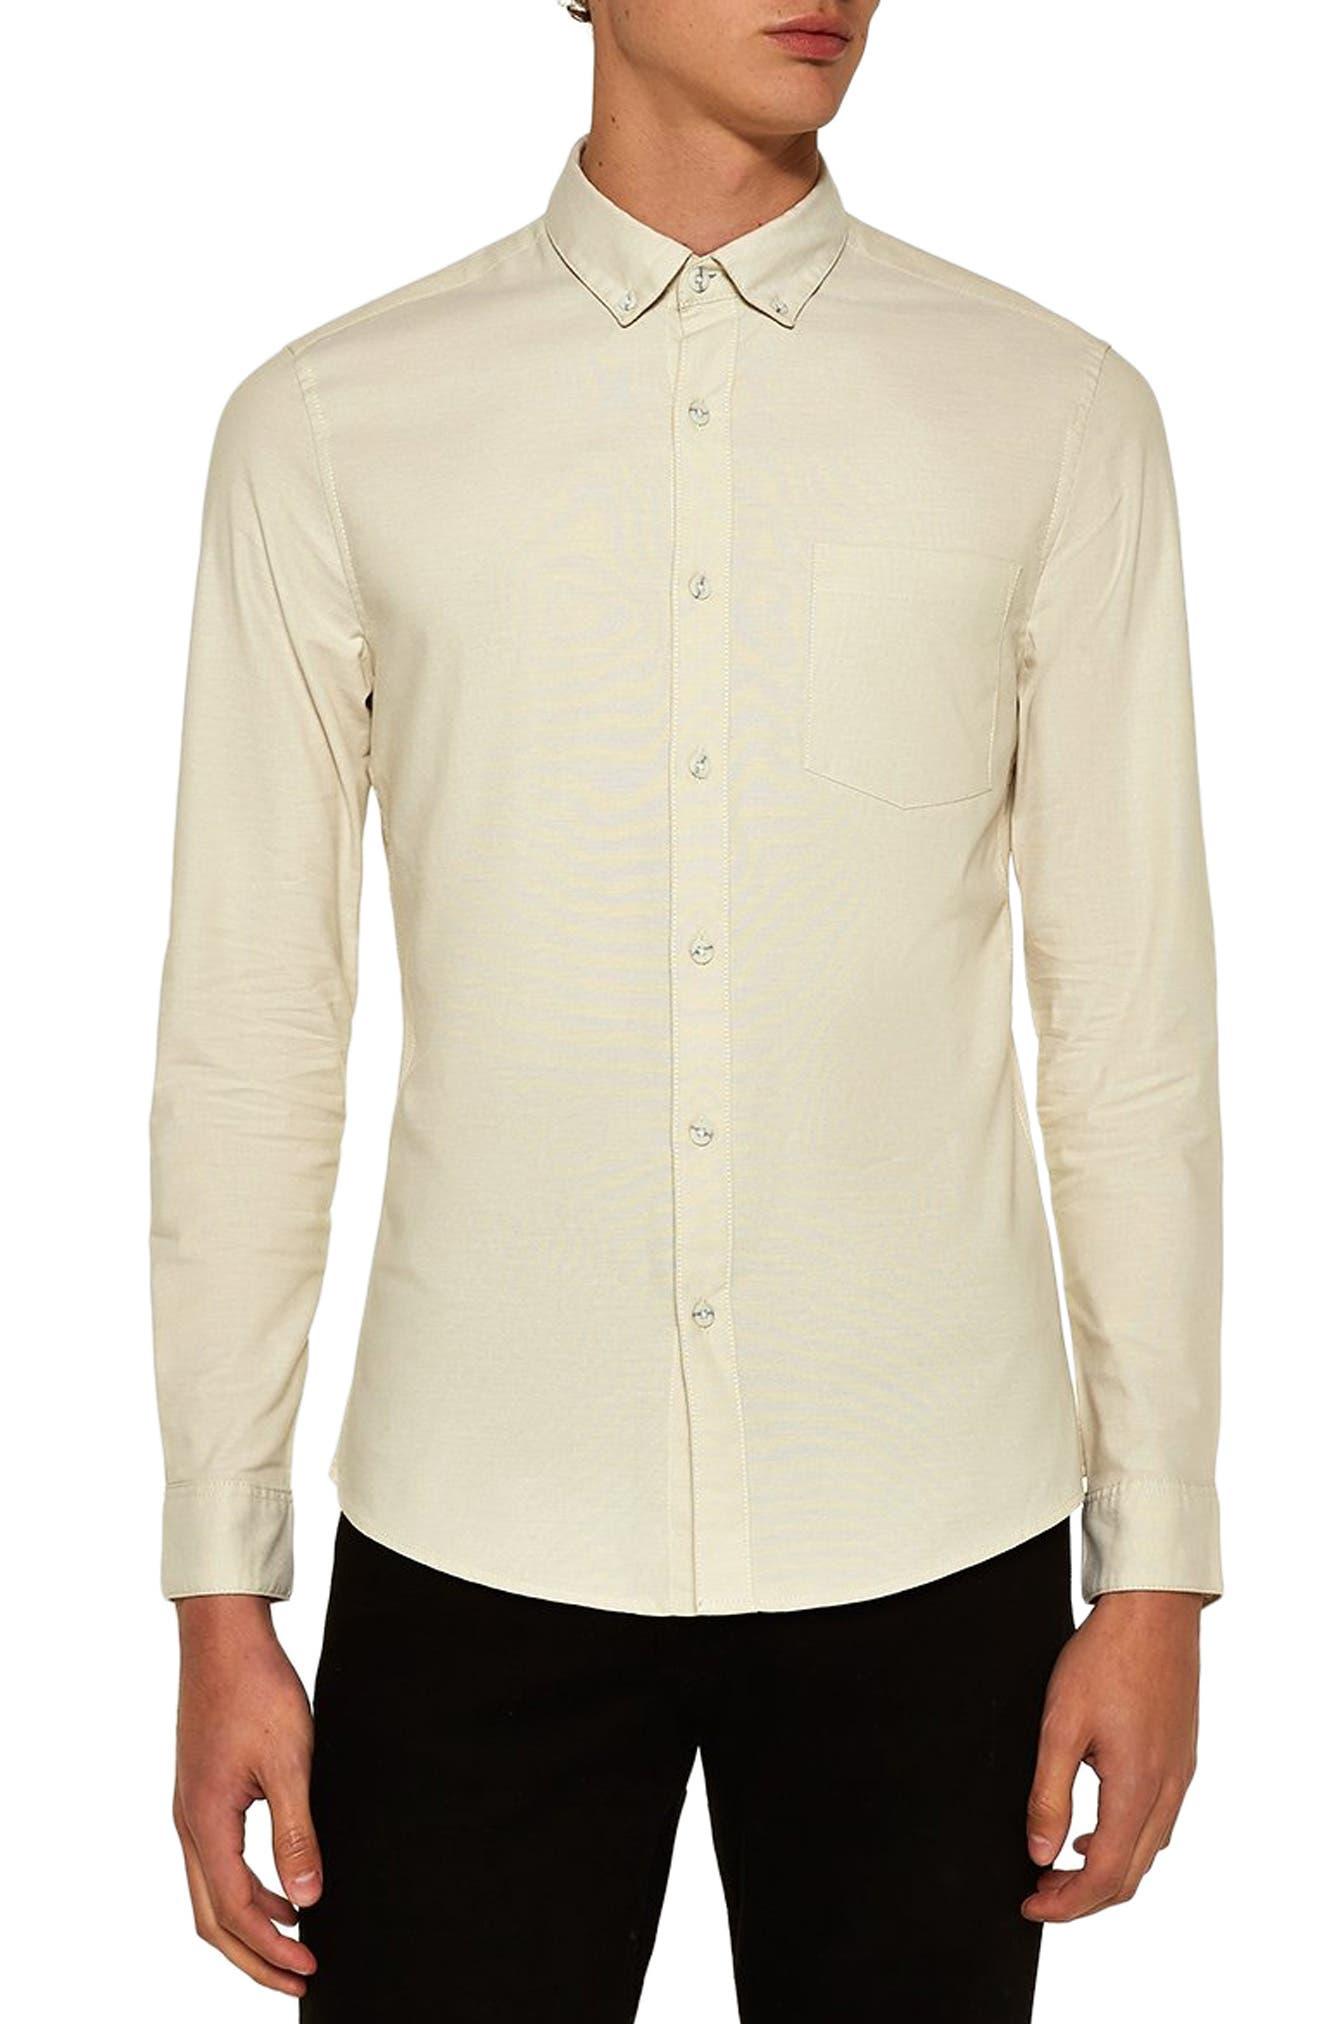 TOPMAN Muscle Fit Stripe Oxford Shirt, Main, color, 250